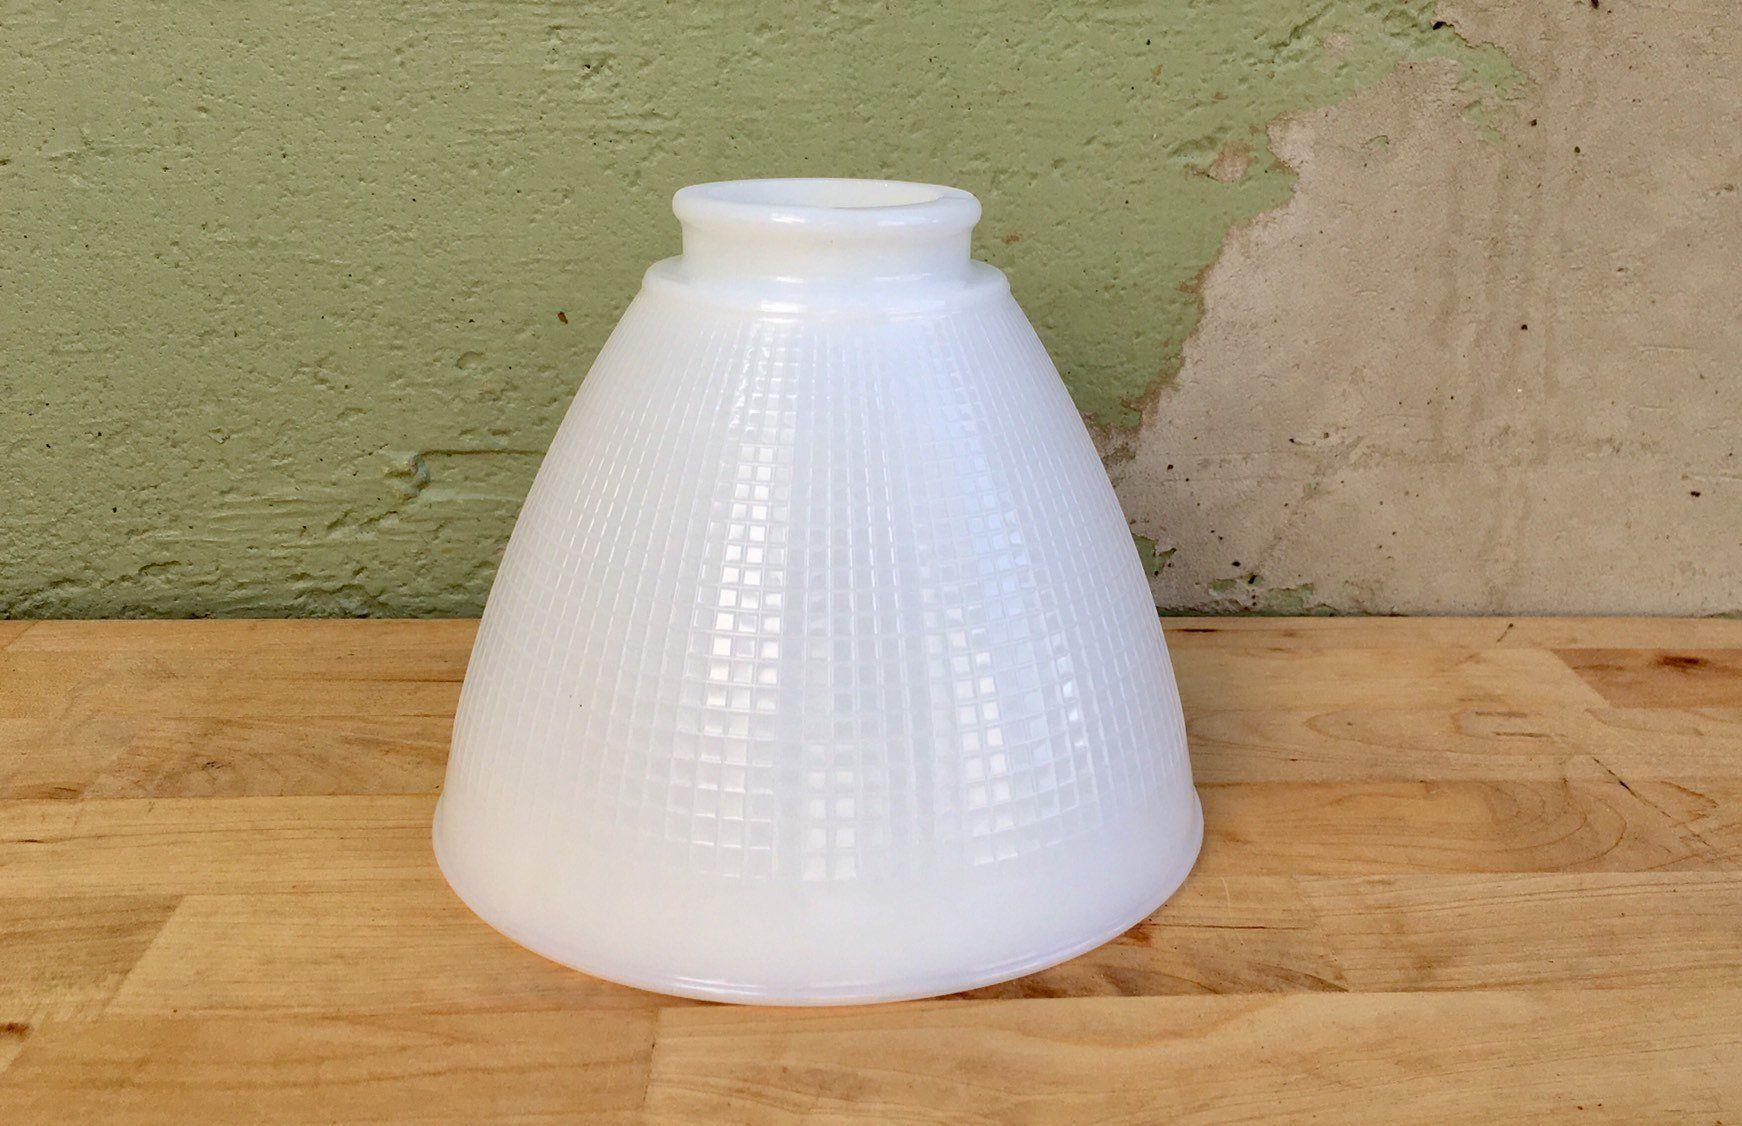 Vintage Milk Glass Mid Century Replacement Globe Retro Style Lighting Waffle Weave Floor Table Lamp Diffuser Refl Floor Table Lamps Vintage Lighting Milk Glass